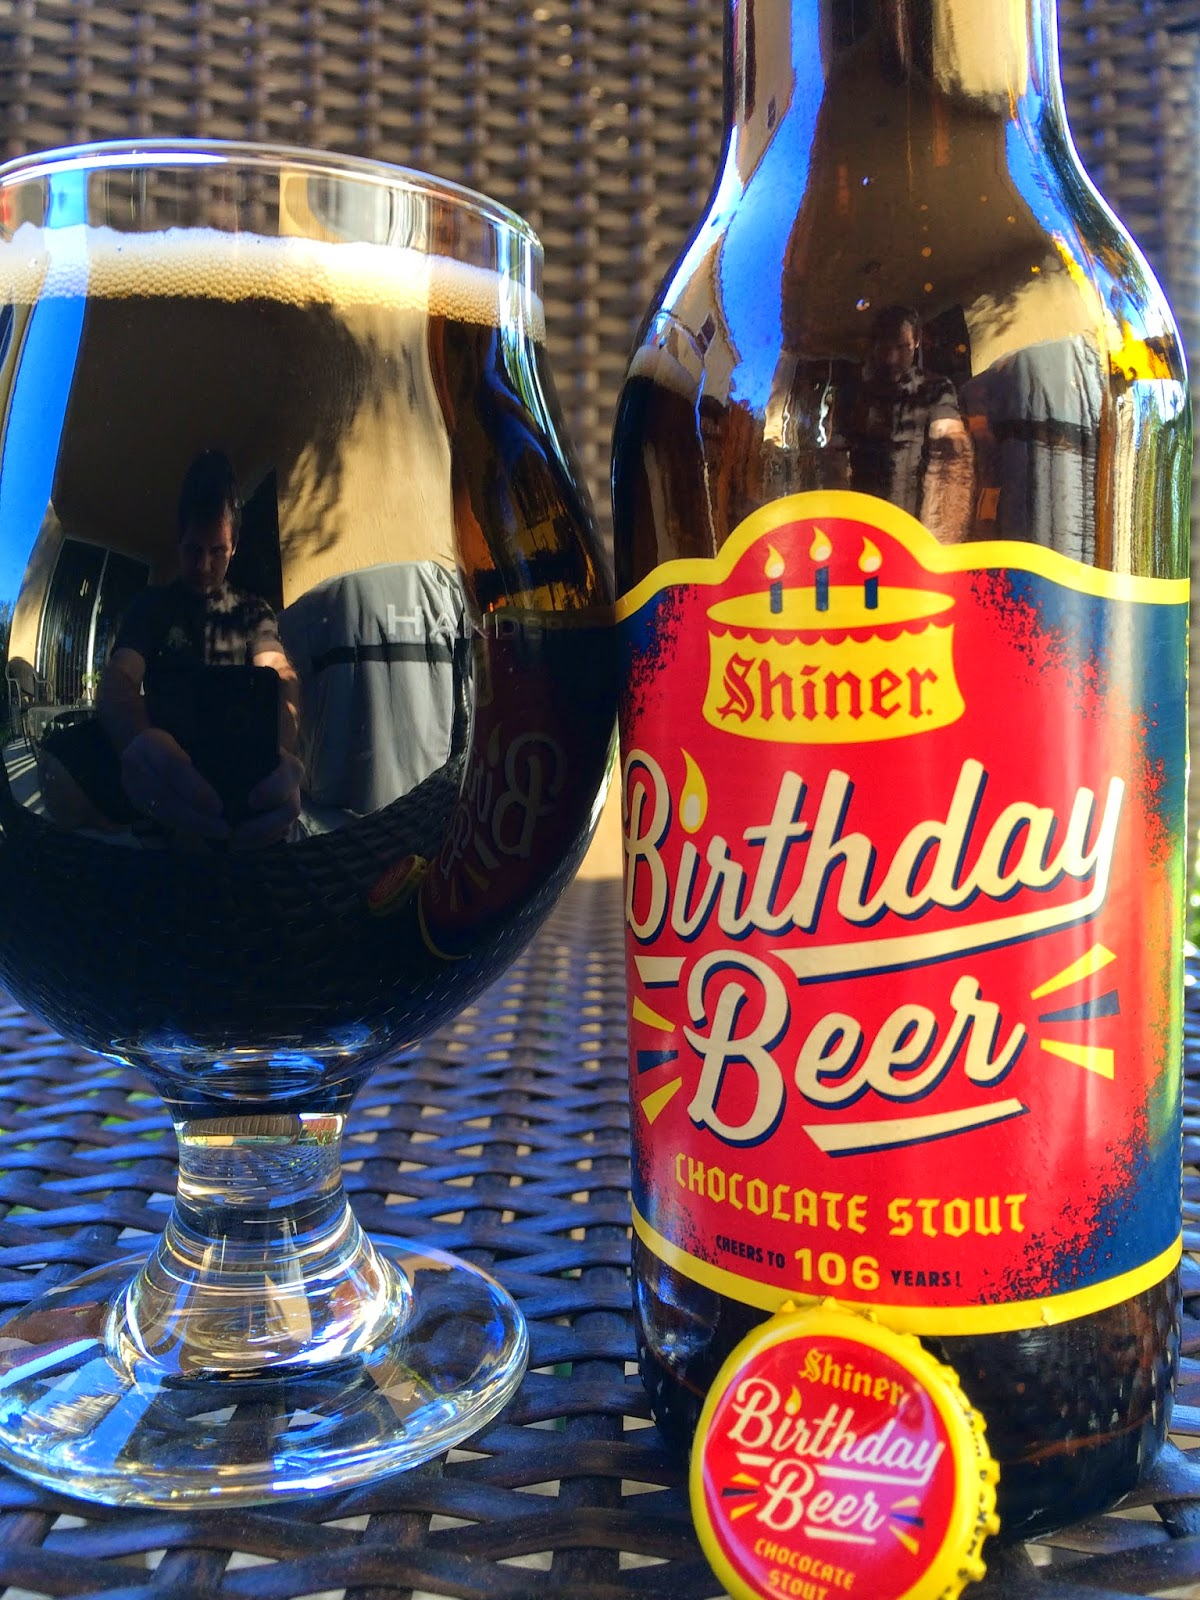 Birthday Cake Brewery